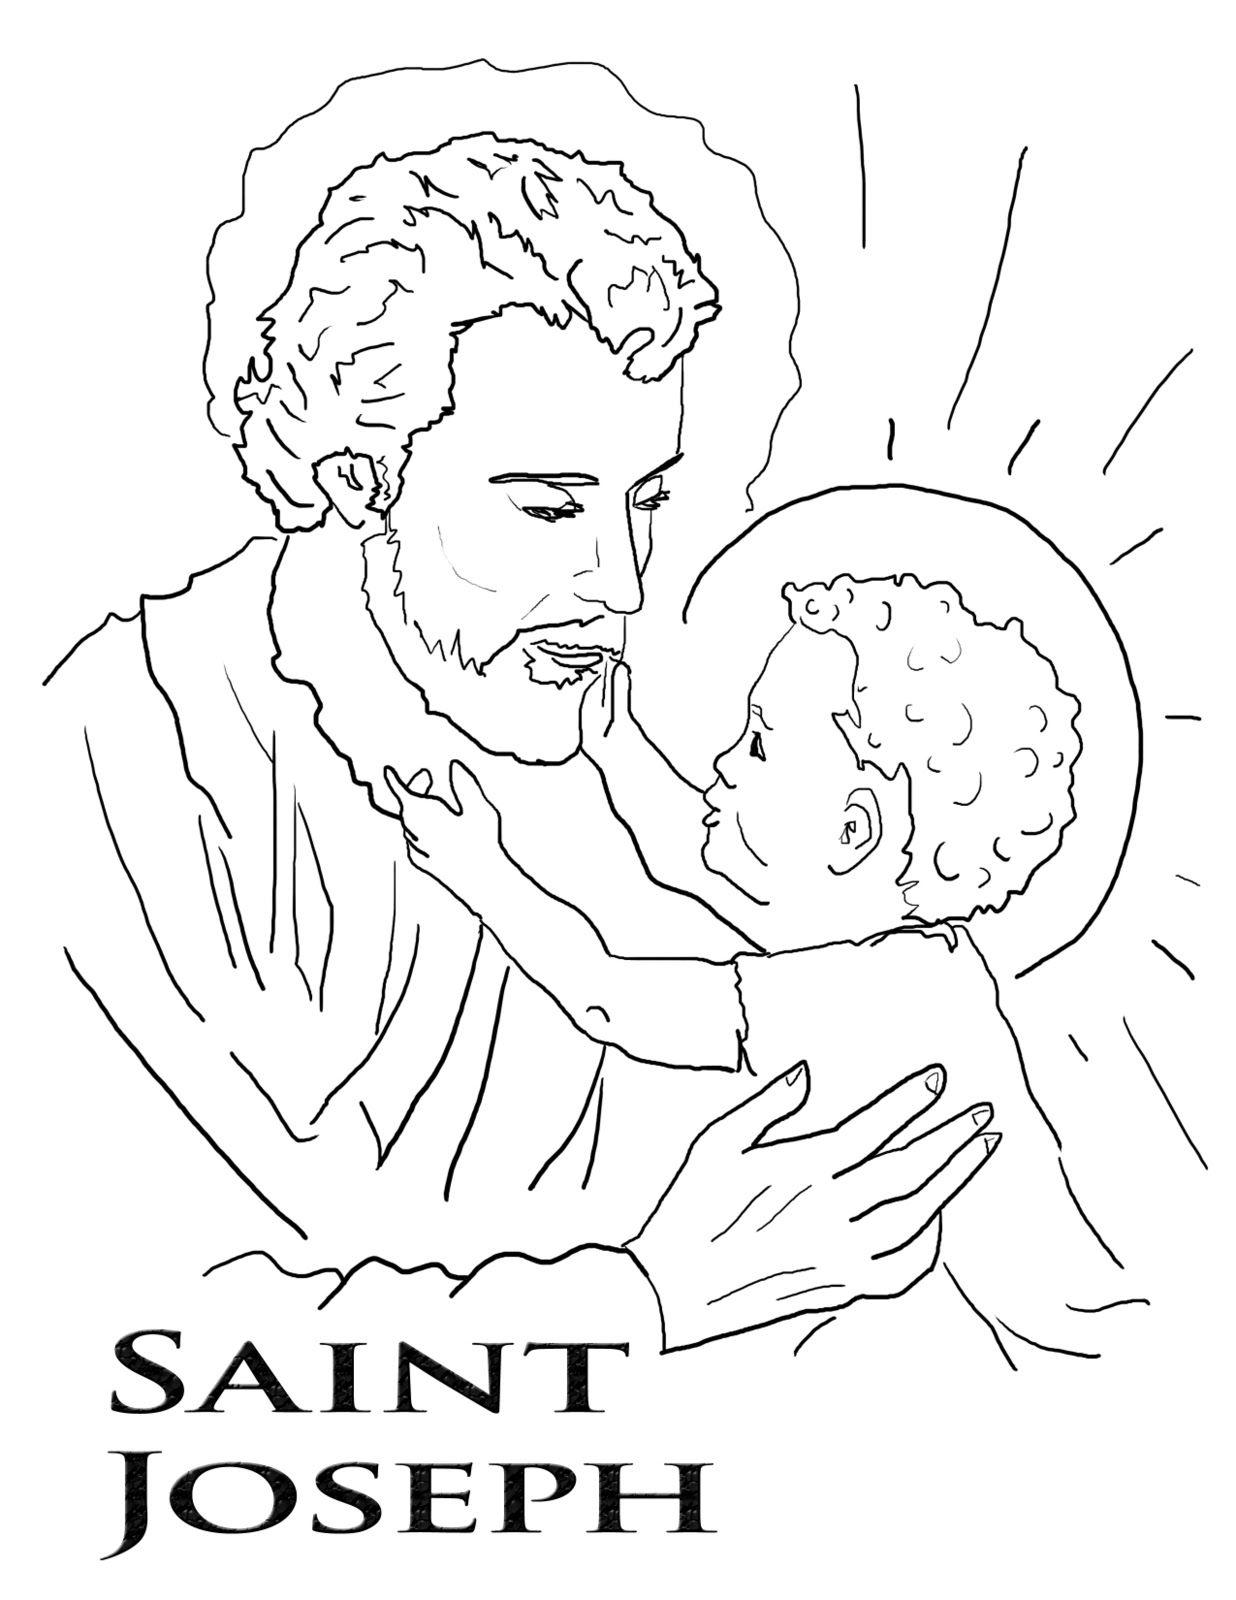 St Joseph Coloring Pg2 Tif 1236 1600 Catholic Coloring Coloring Pages Saint Coloring